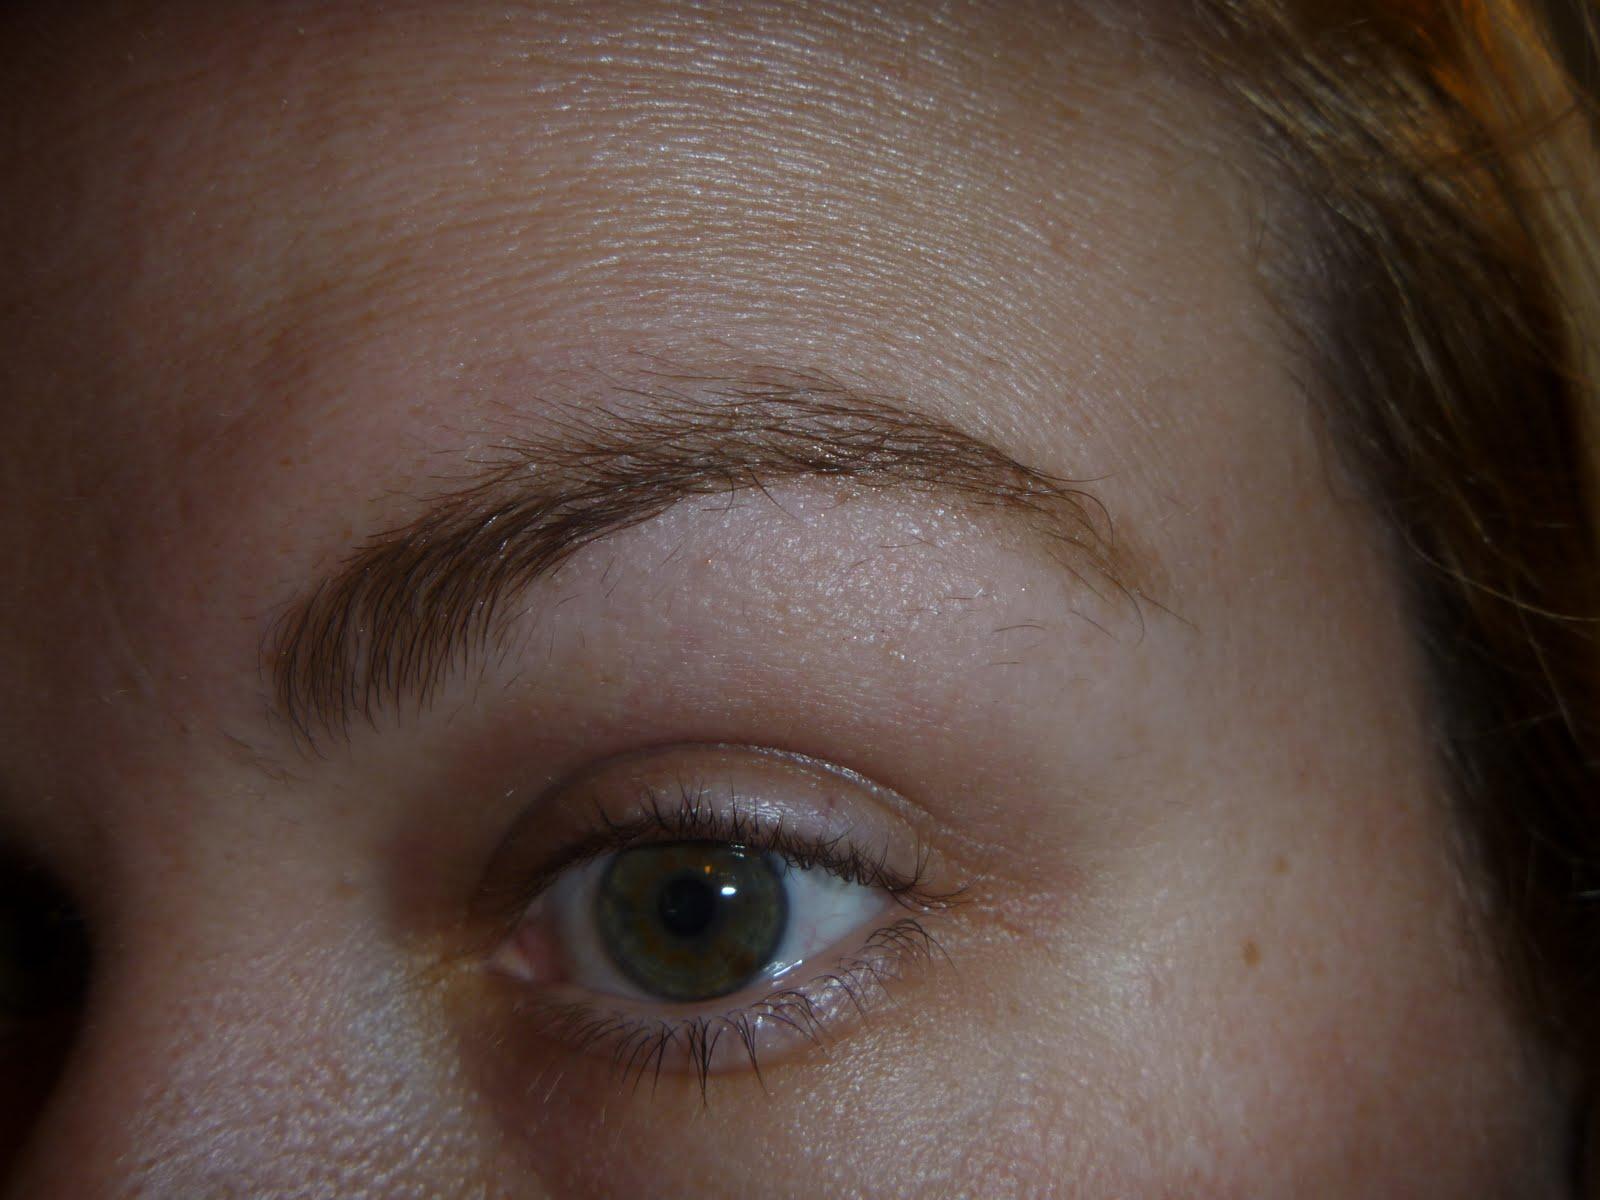 Glitter N Glam Makeup By Chrissy Nyx Eyebrow Cake Powder